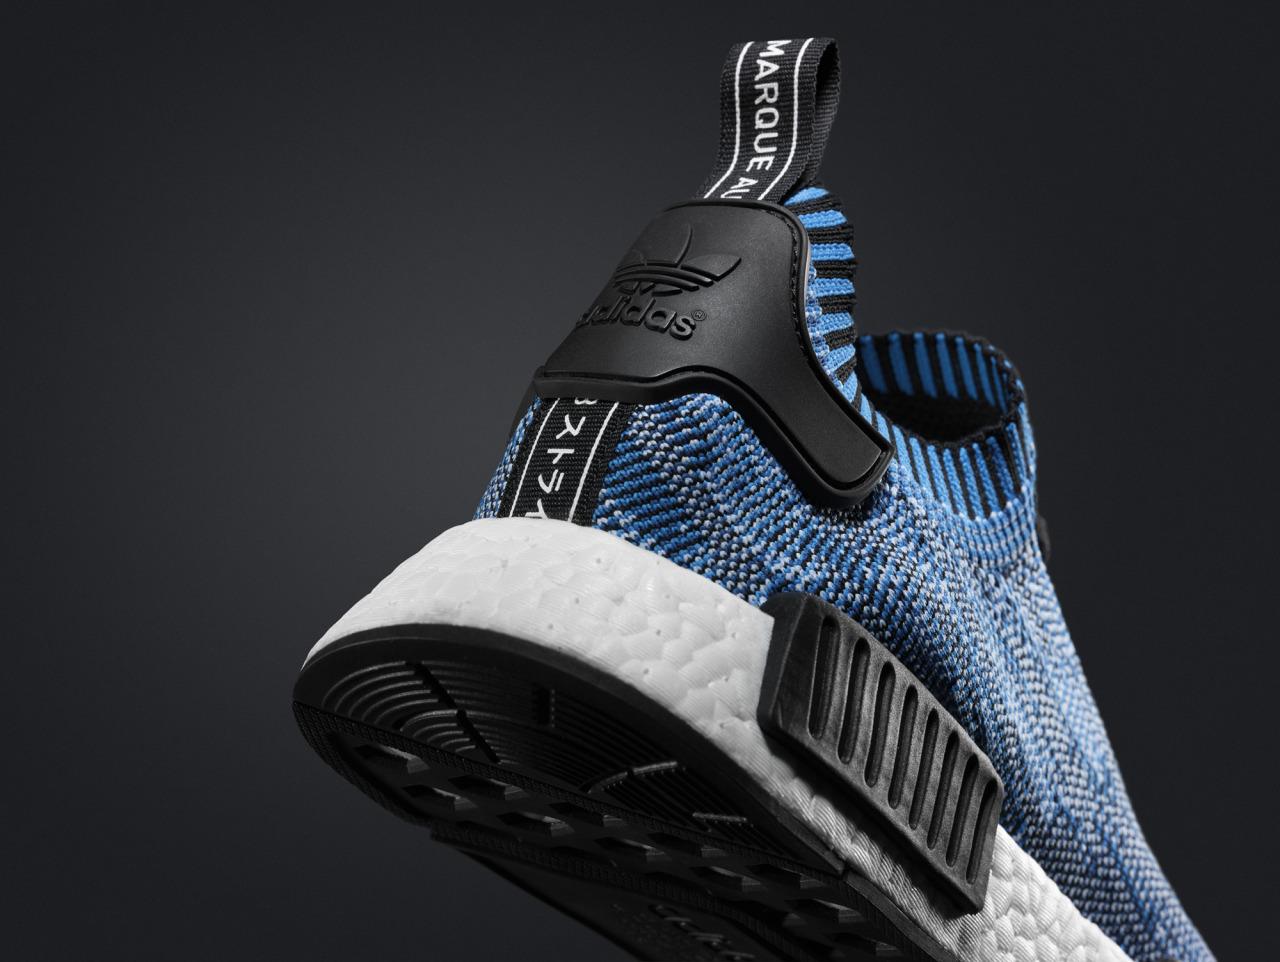 adidas-nmd-r1-primeknit-blue-camo-02